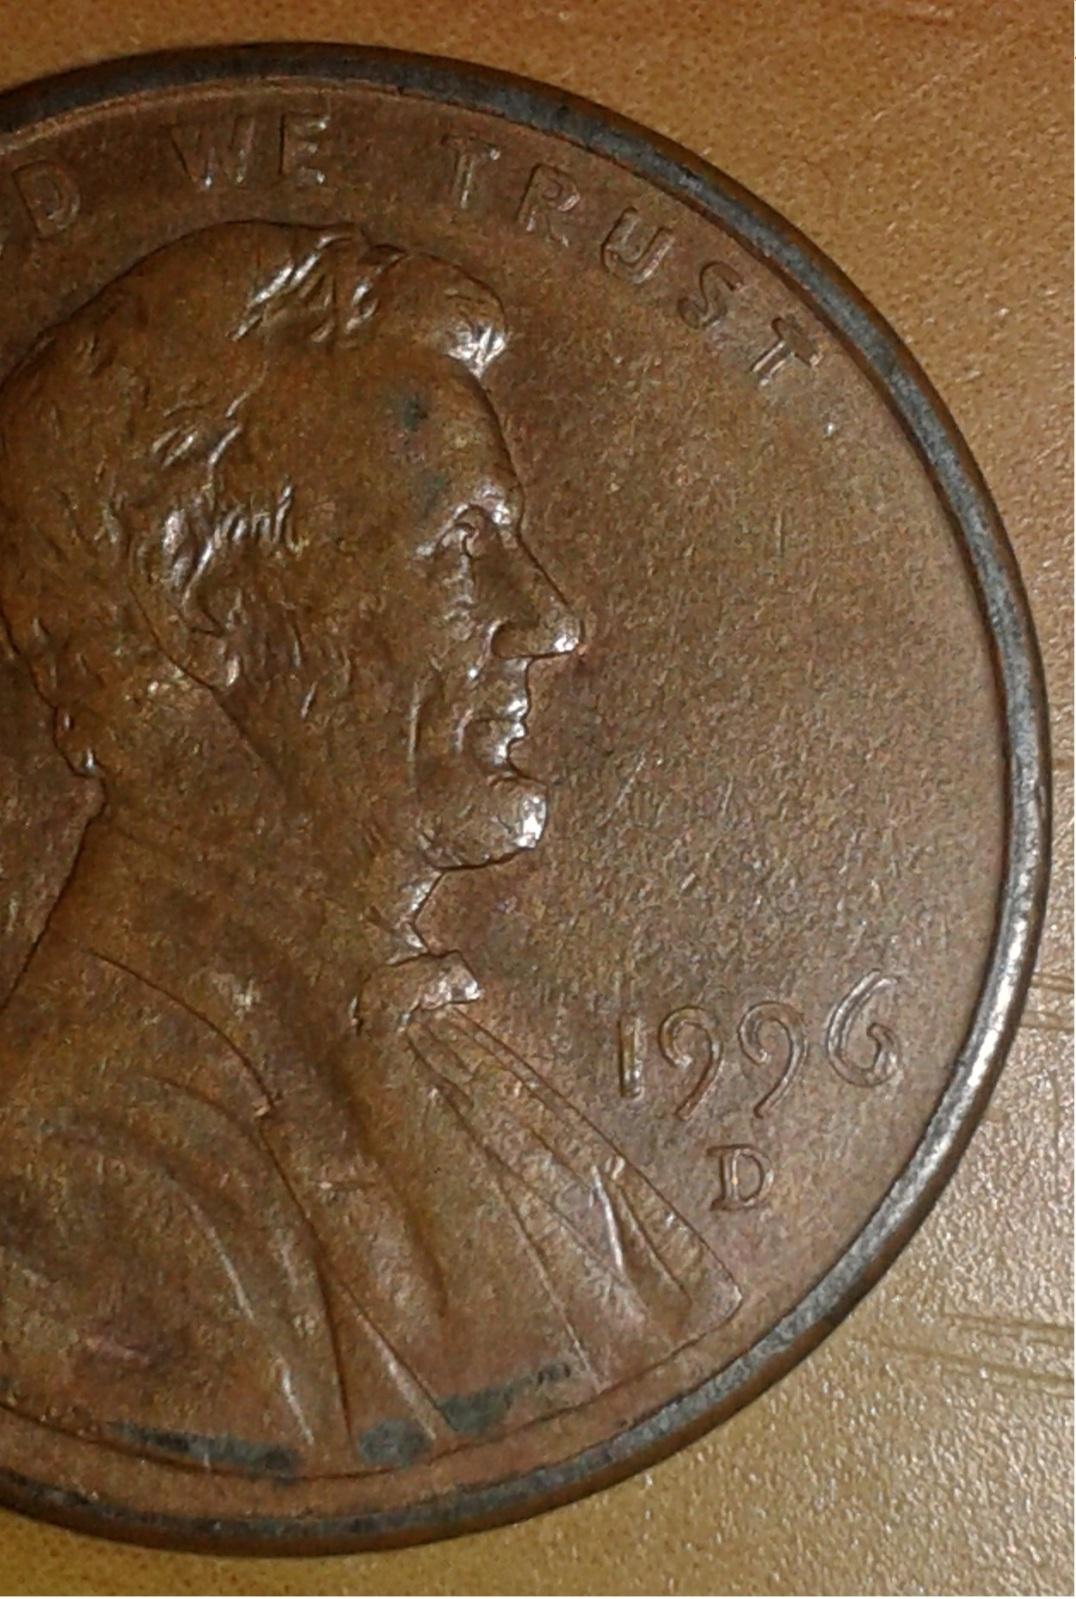 Moneda de un centavo U.S.A. 1996 Fwnhcj